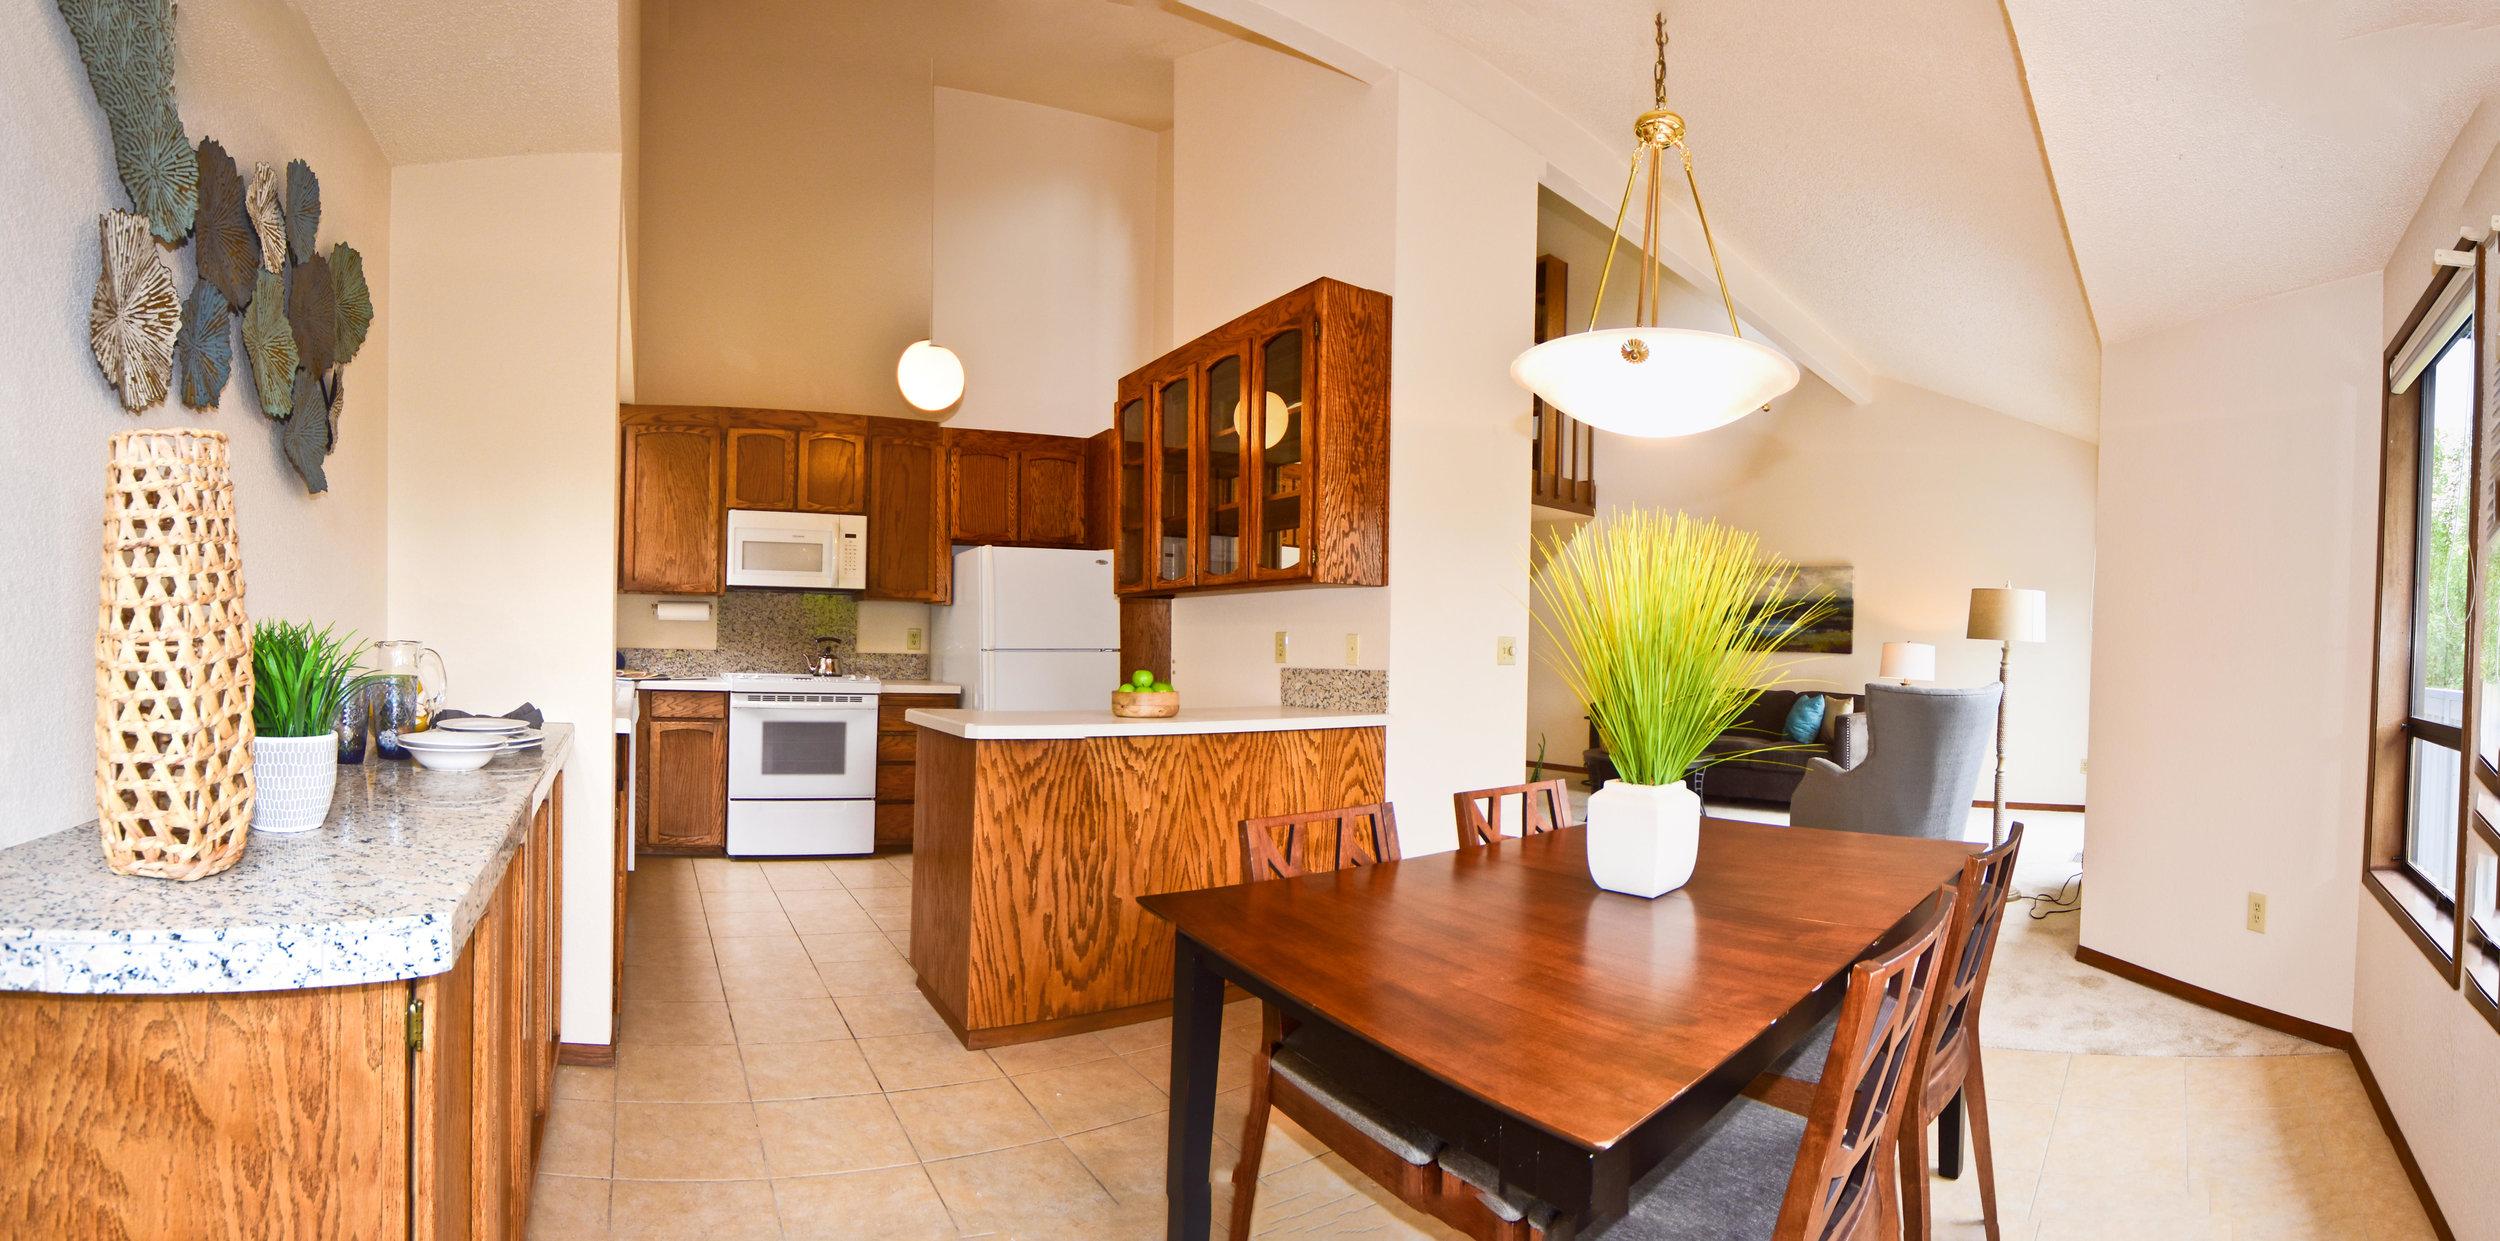 dining kitchen- living.jpg